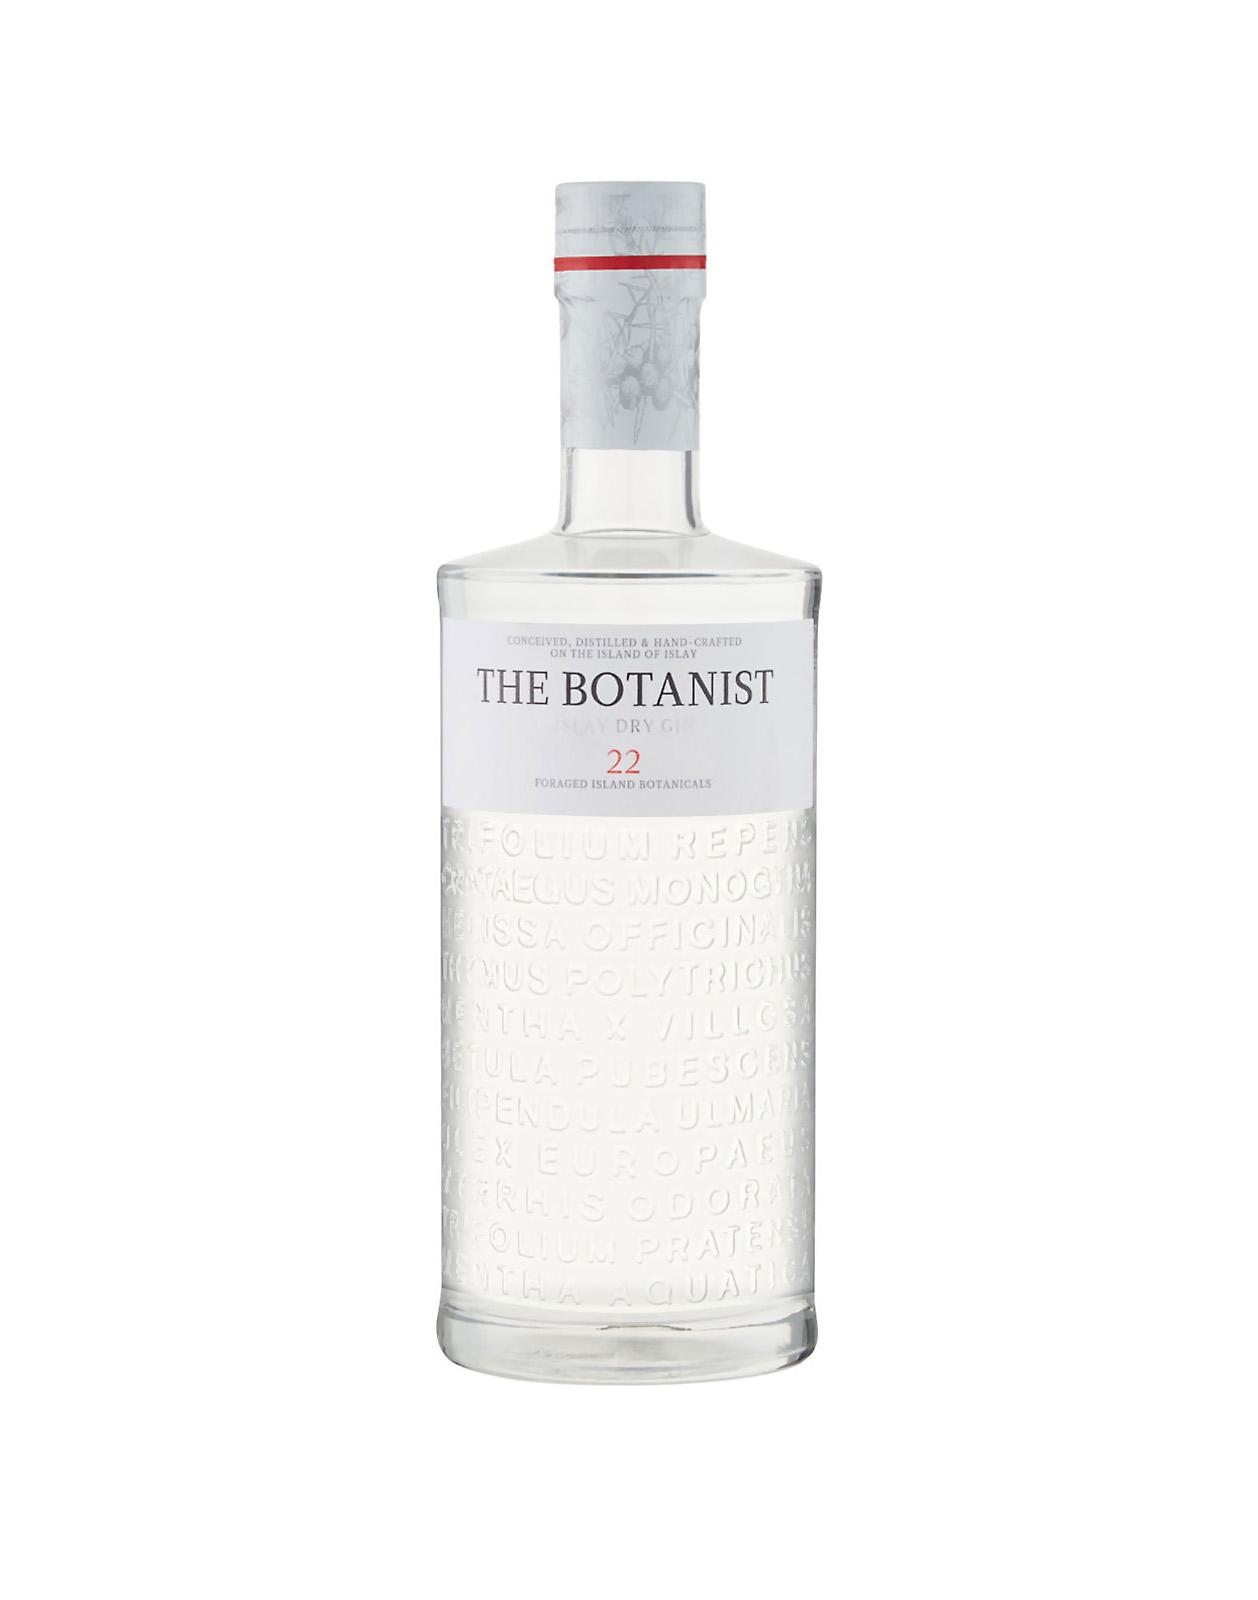 Botanist Islay Dry 46%, Bottleshop Sunny wines slnecnice mesto, petrzalka, Gin, rozvoz alkoholu, eshop